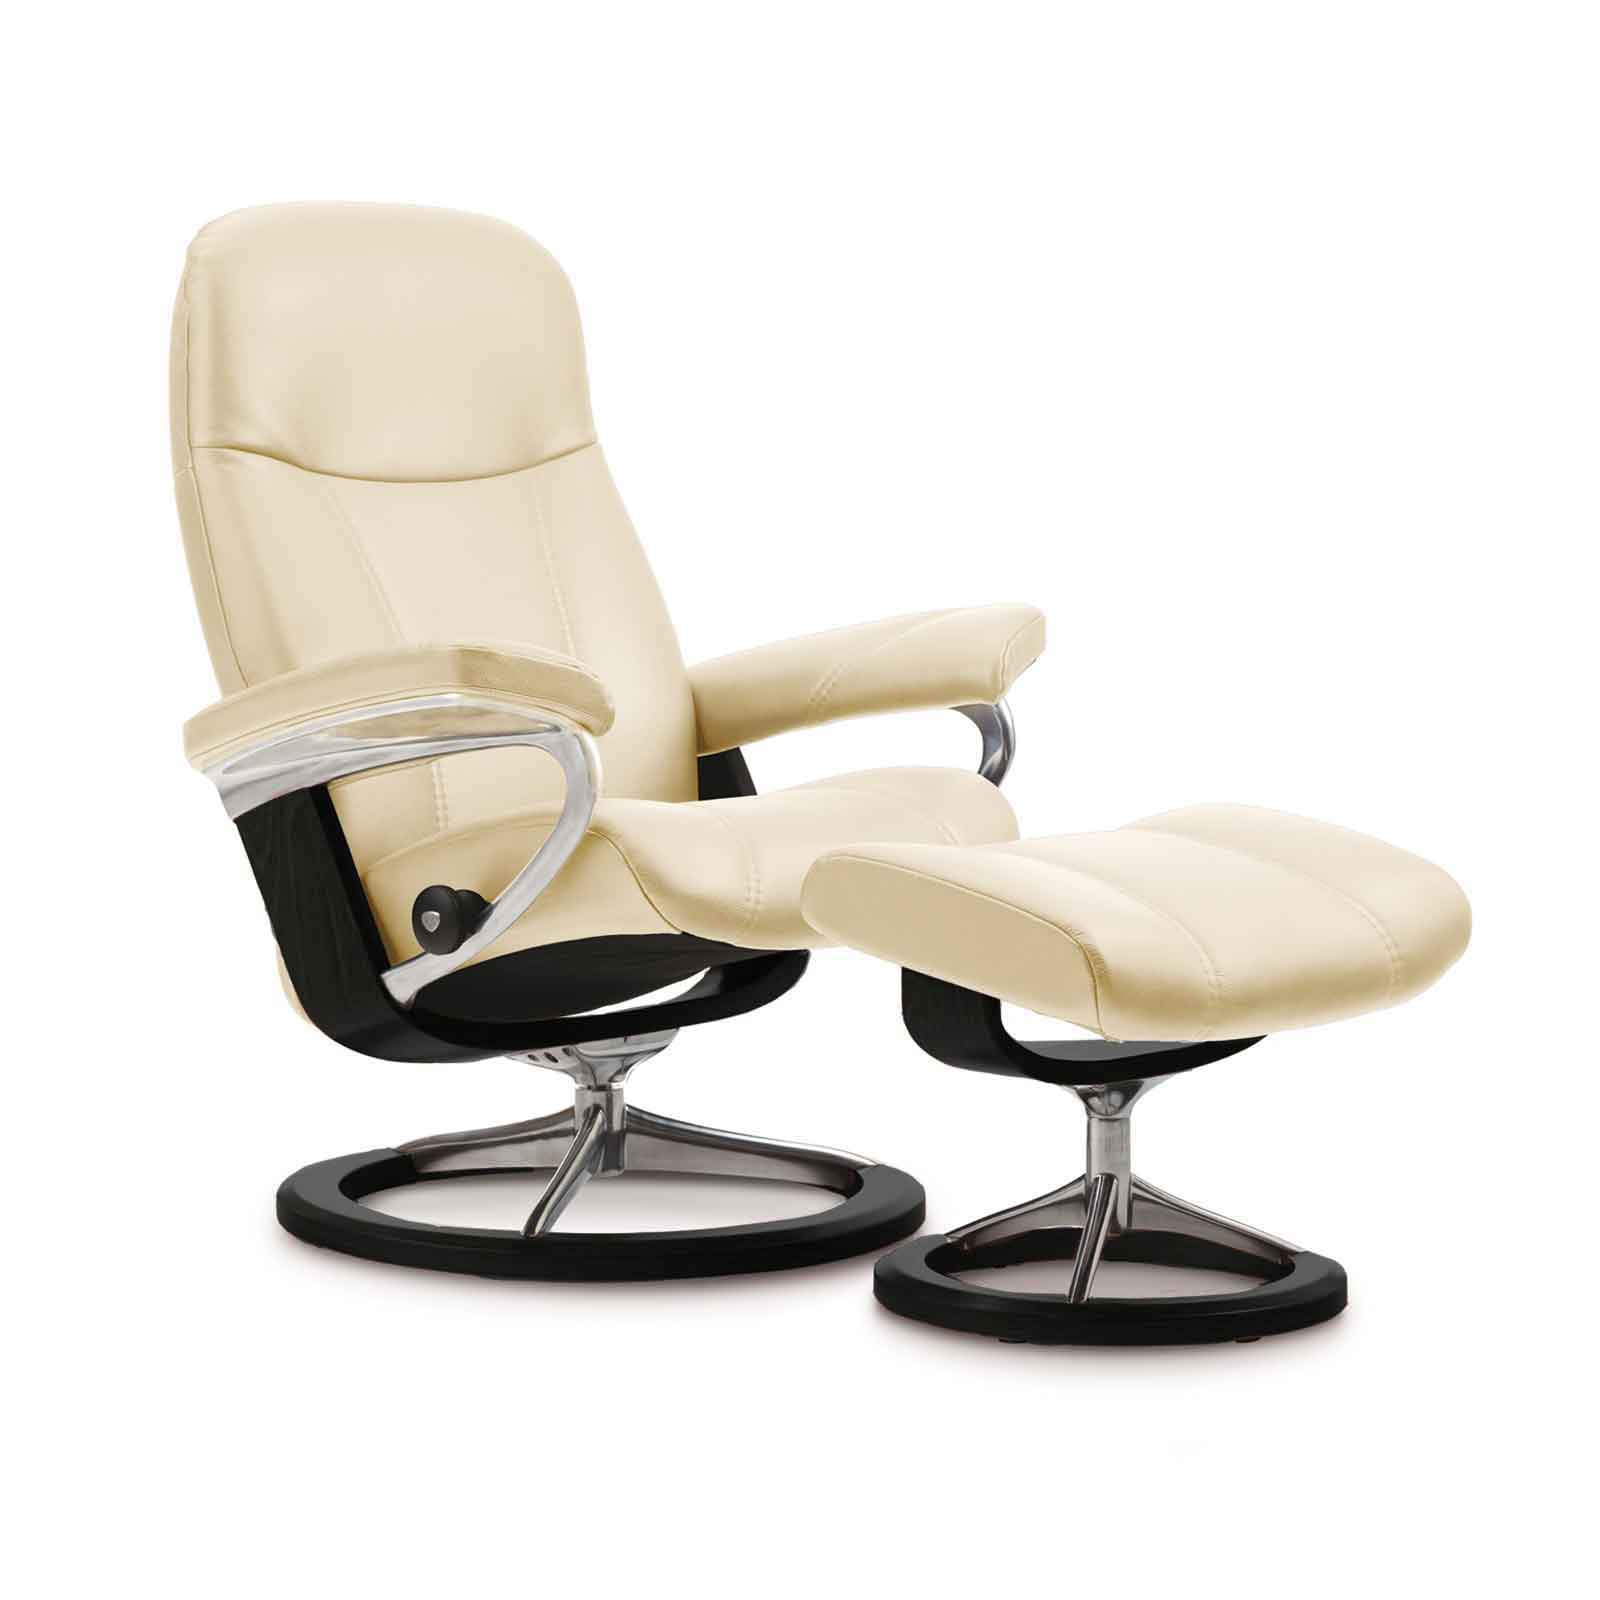 stressless sessel mit hocker consul williamflooring. Black Bedroom Furniture Sets. Home Design Ideas